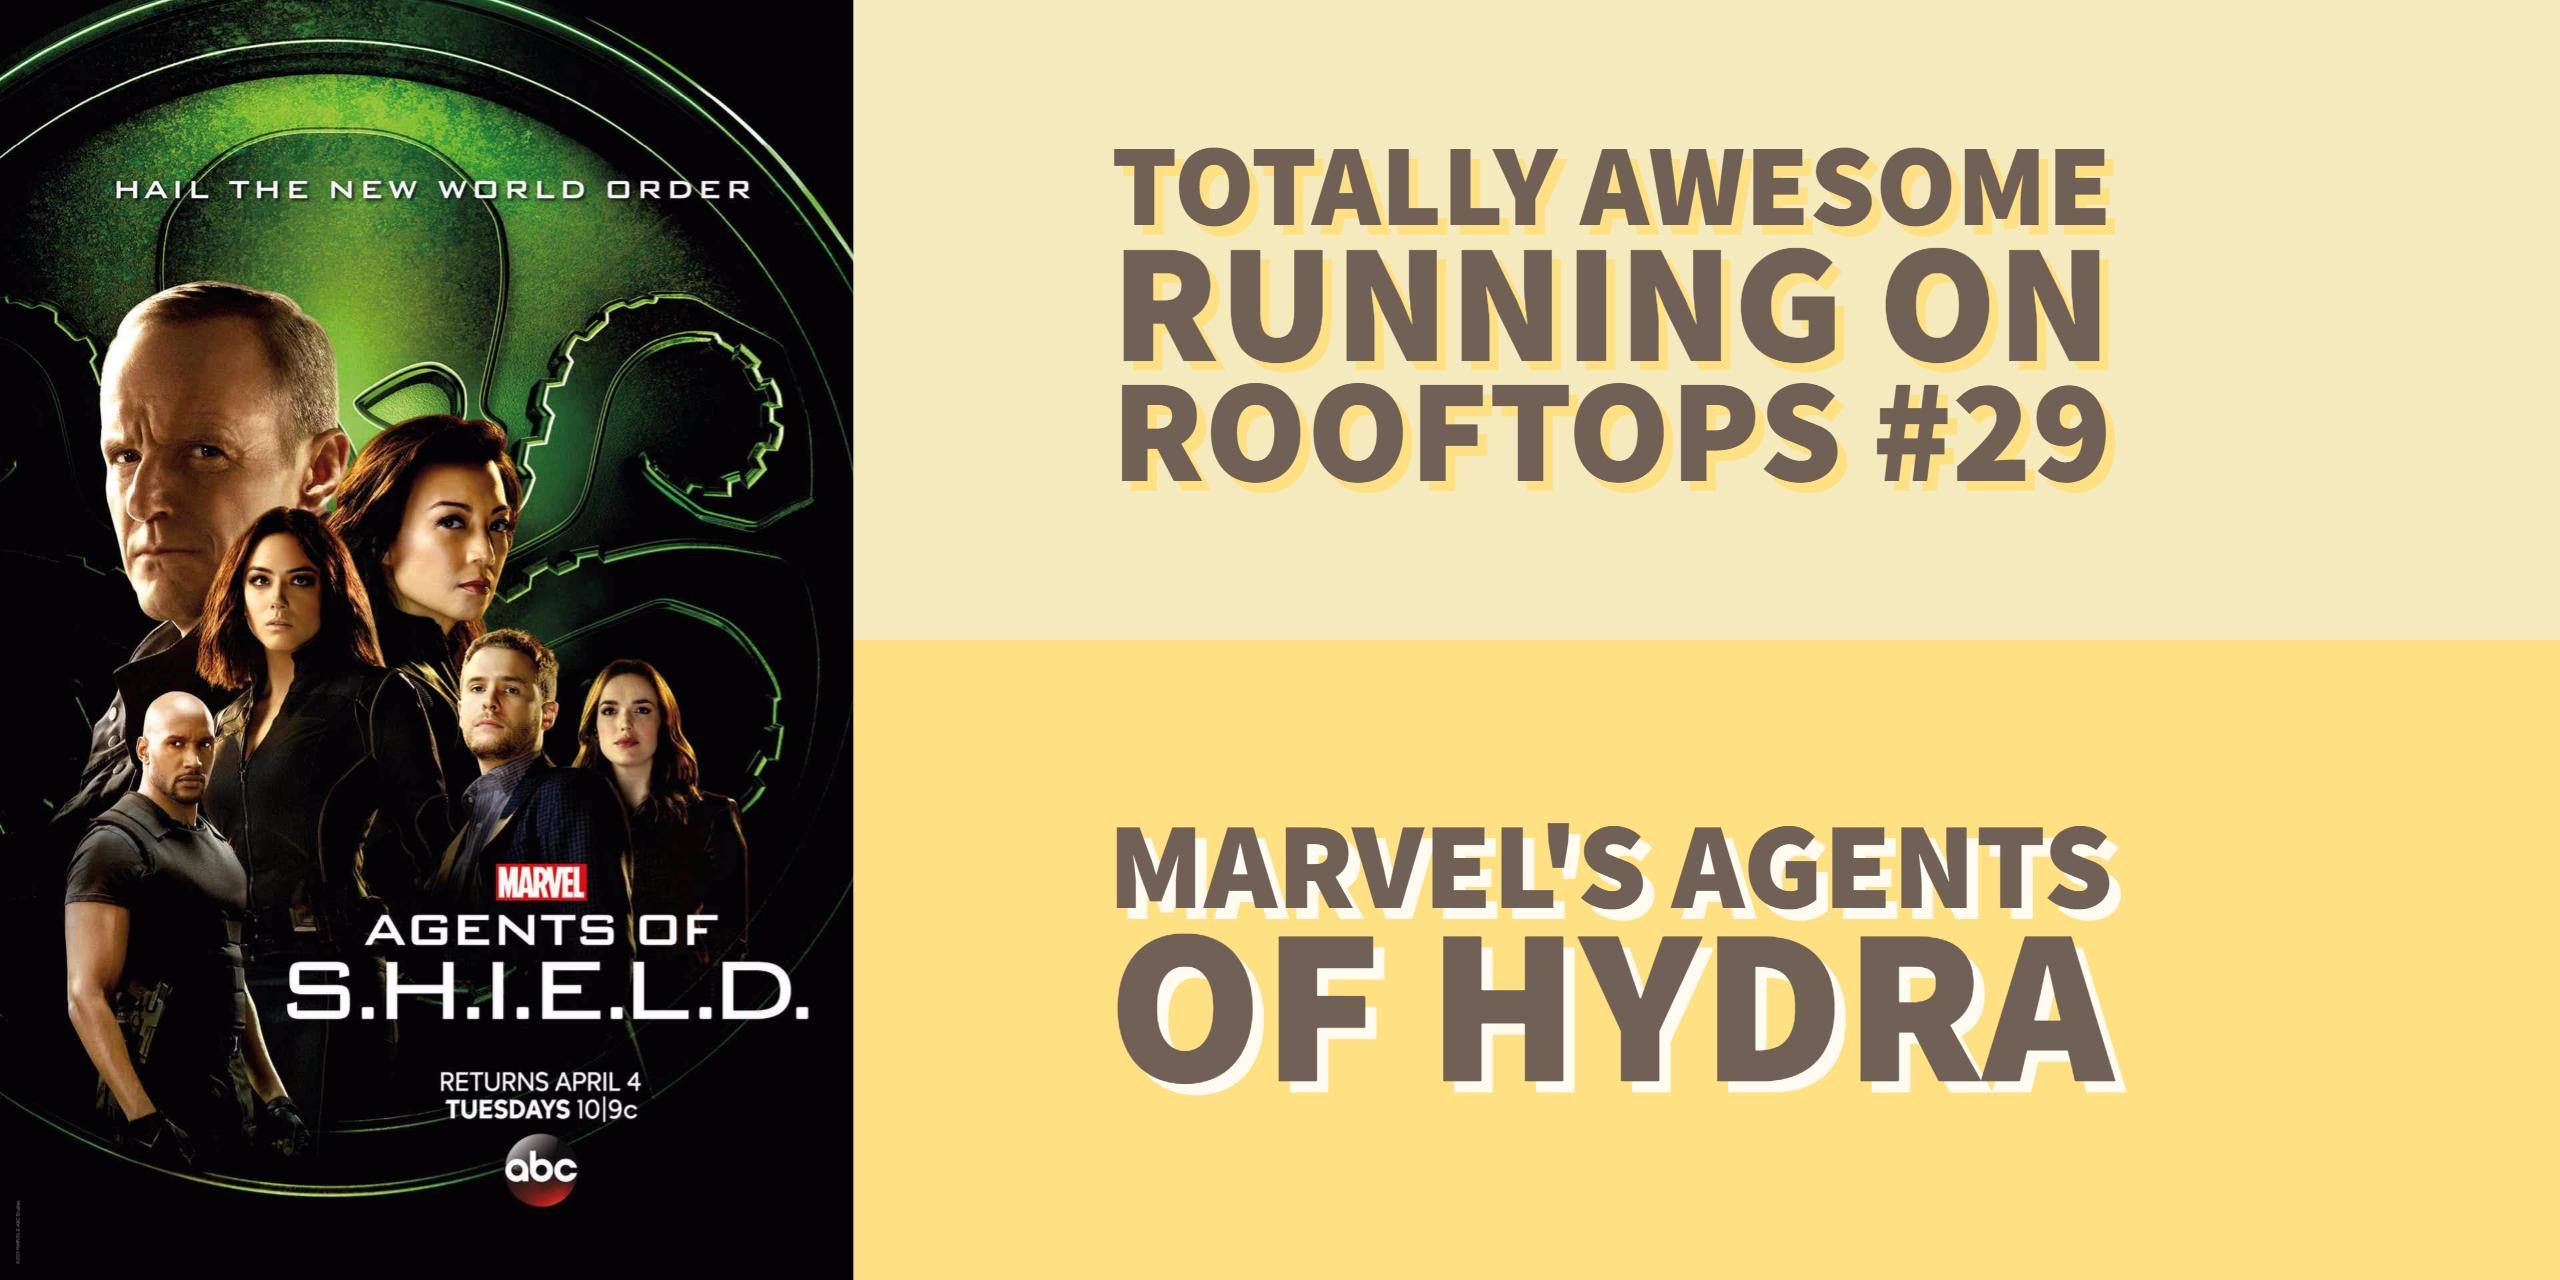 Marvel's Agent's of Hydra